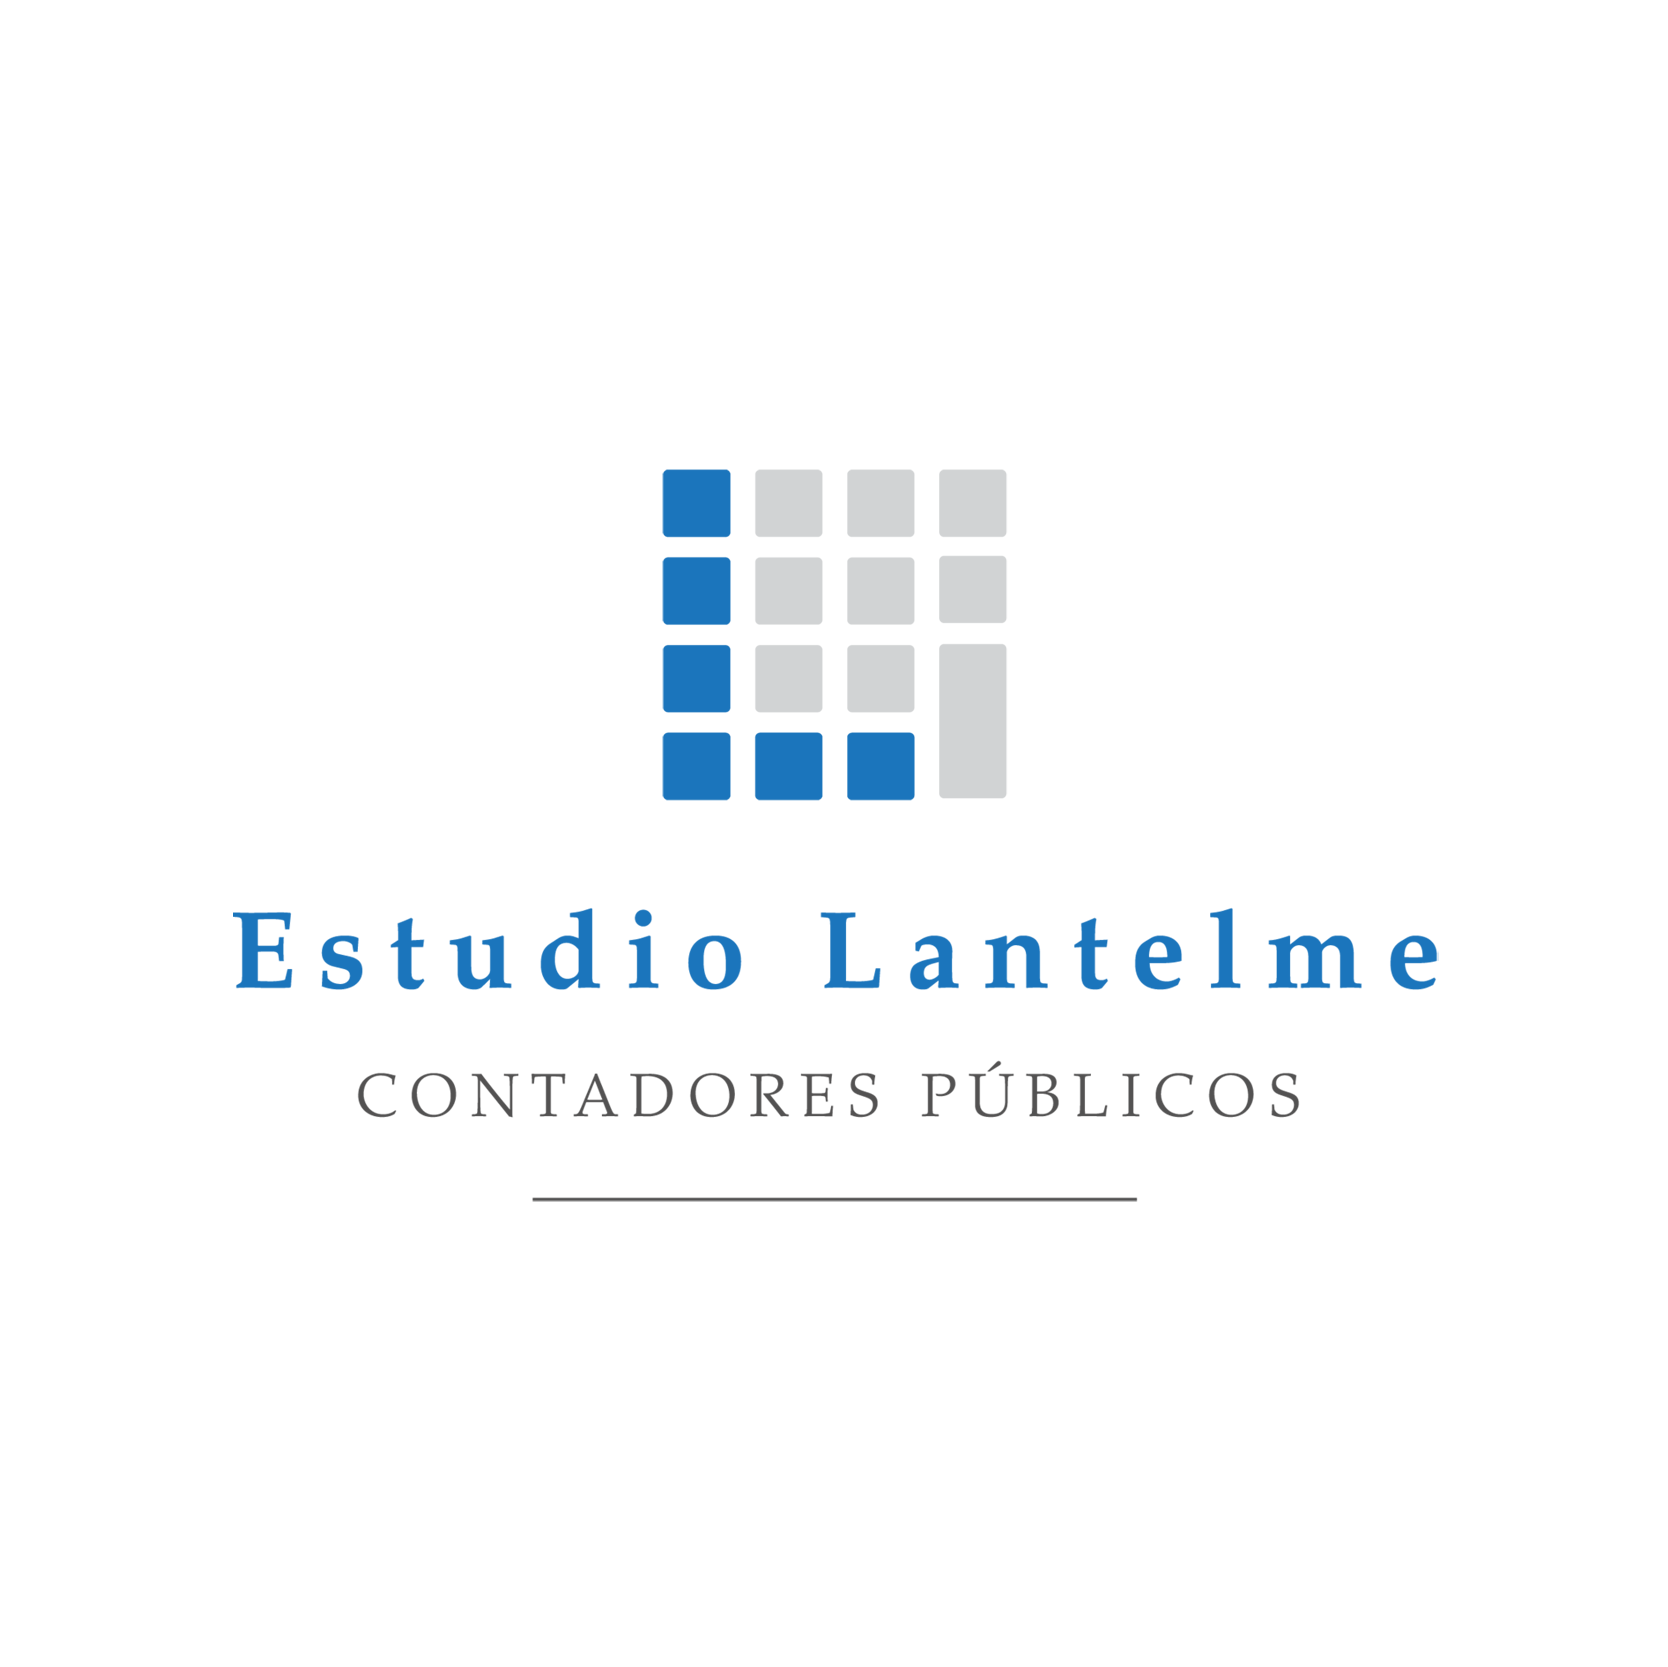 Logos_clientes-square-Lantelme.png